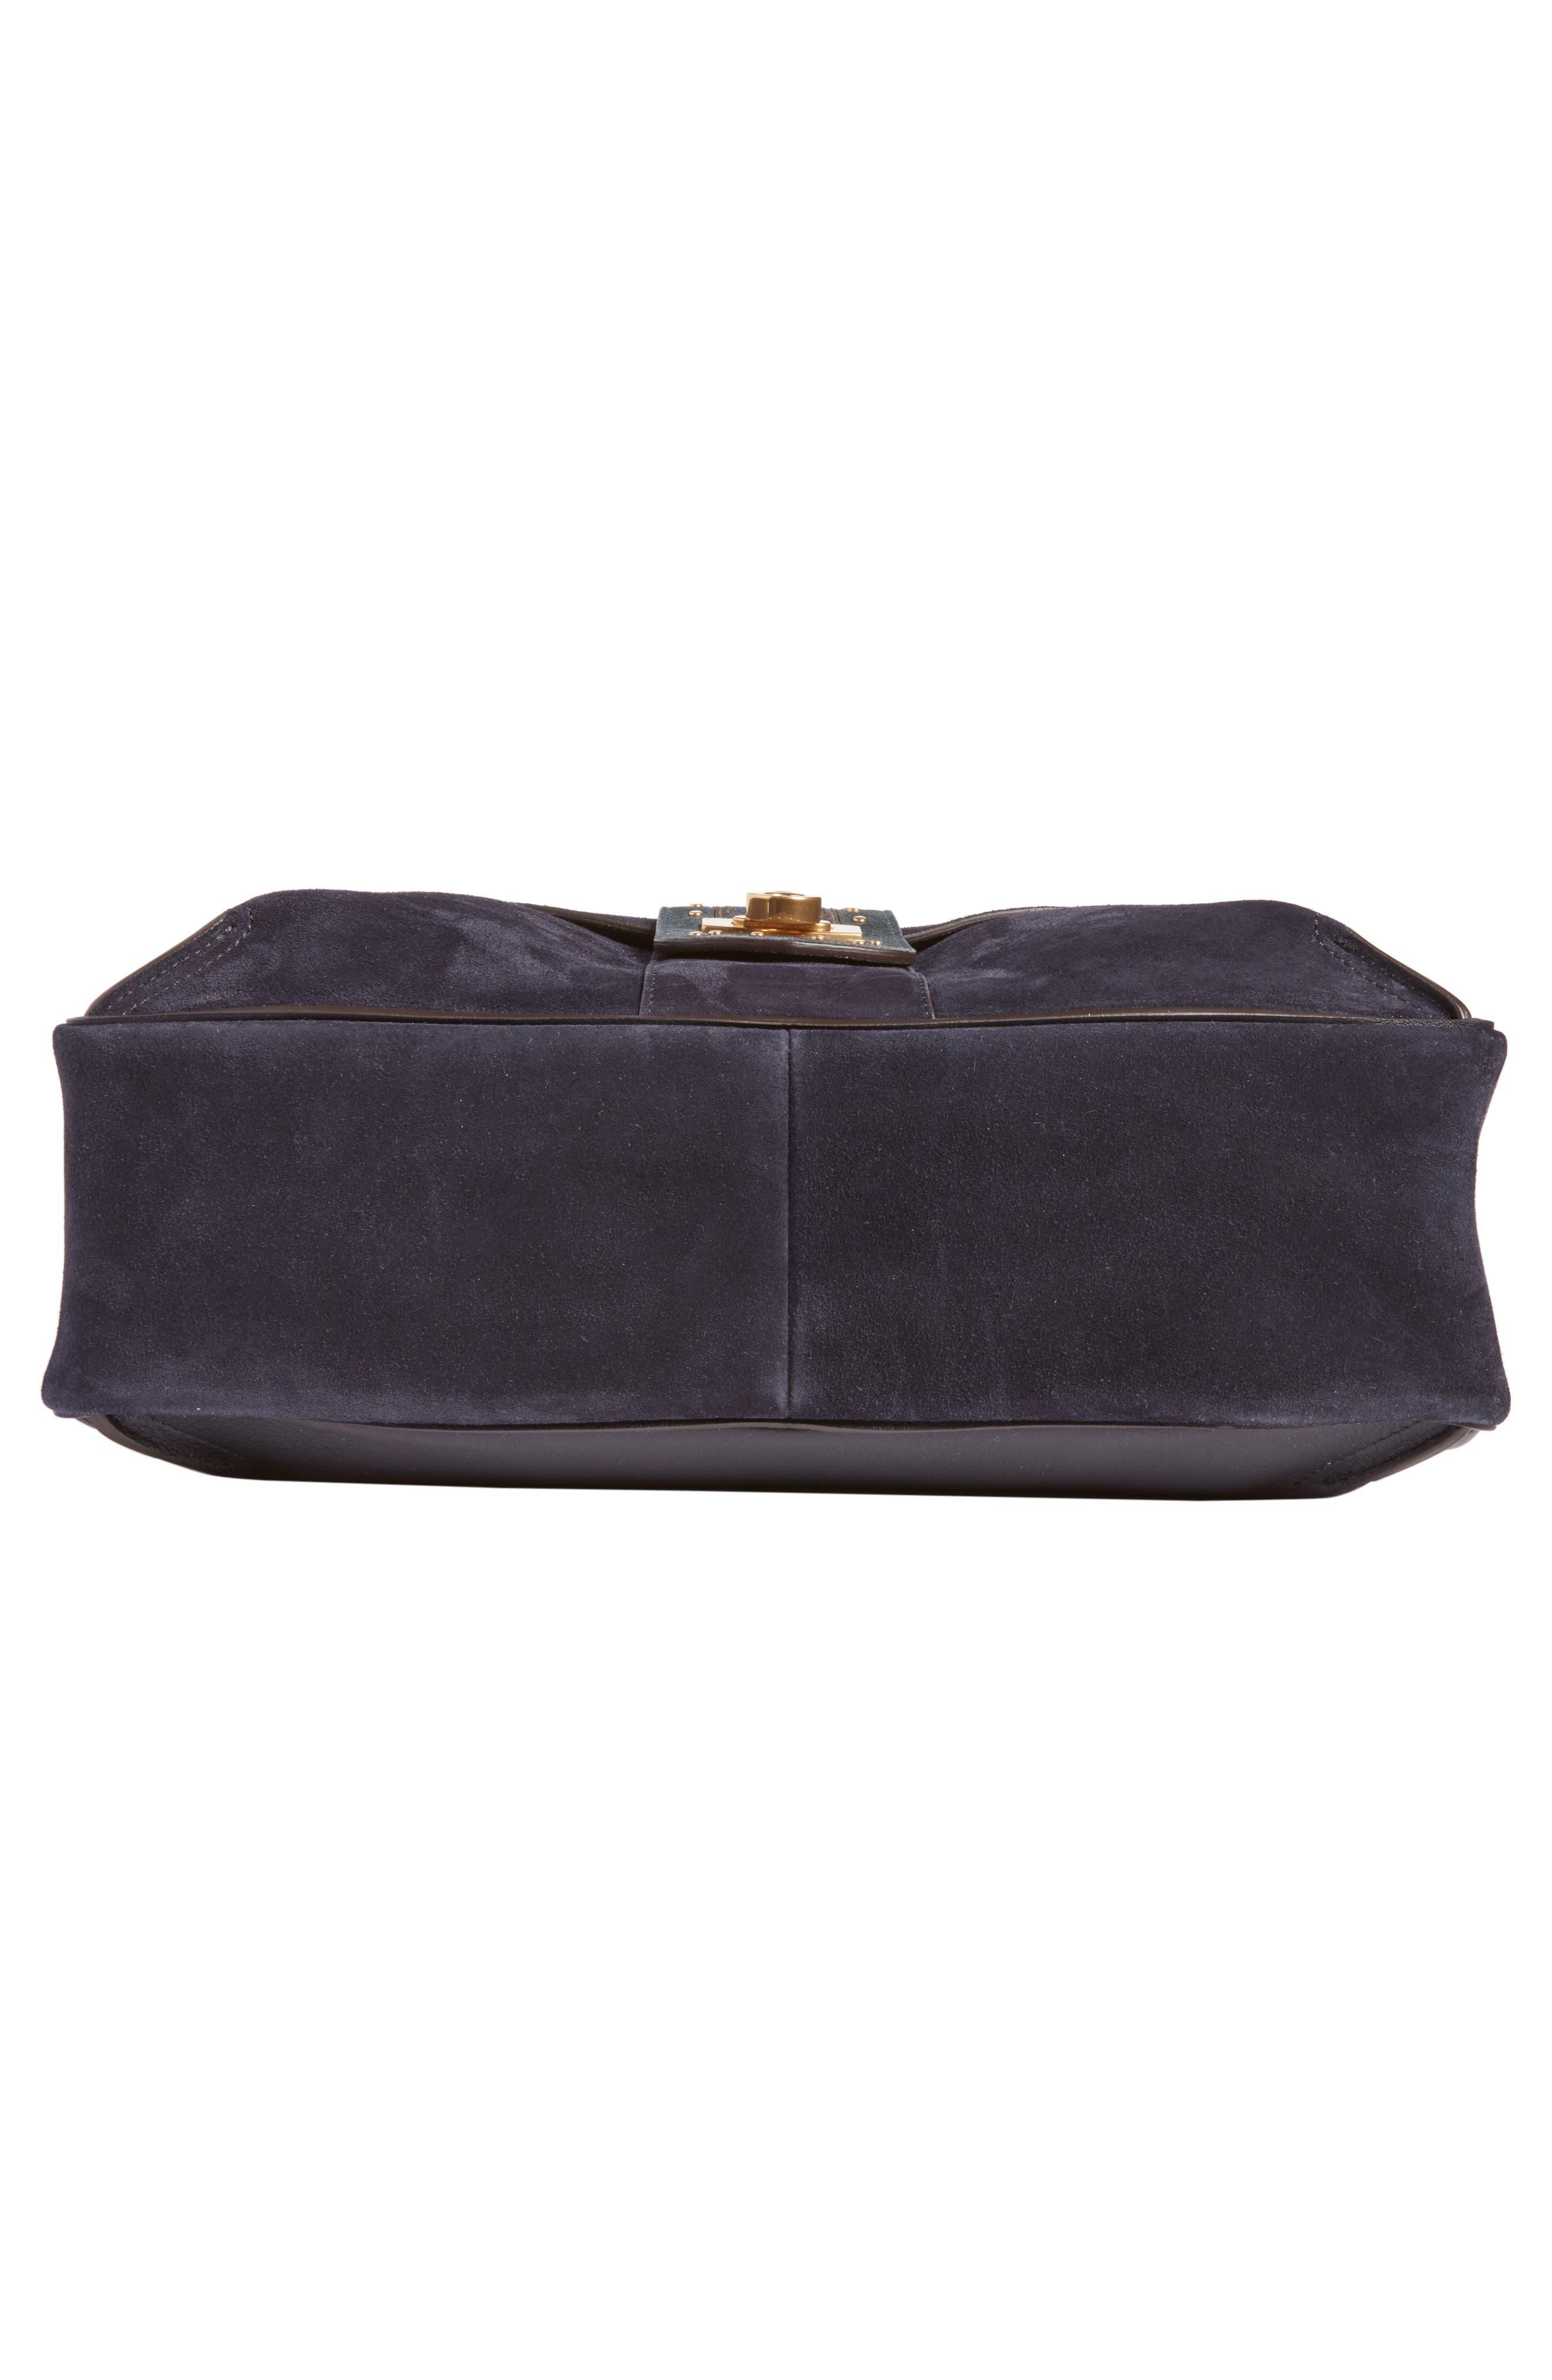 Medium Lexa Suede Shoulder Bag,                             Alternate thumbnail 5, color,                             412